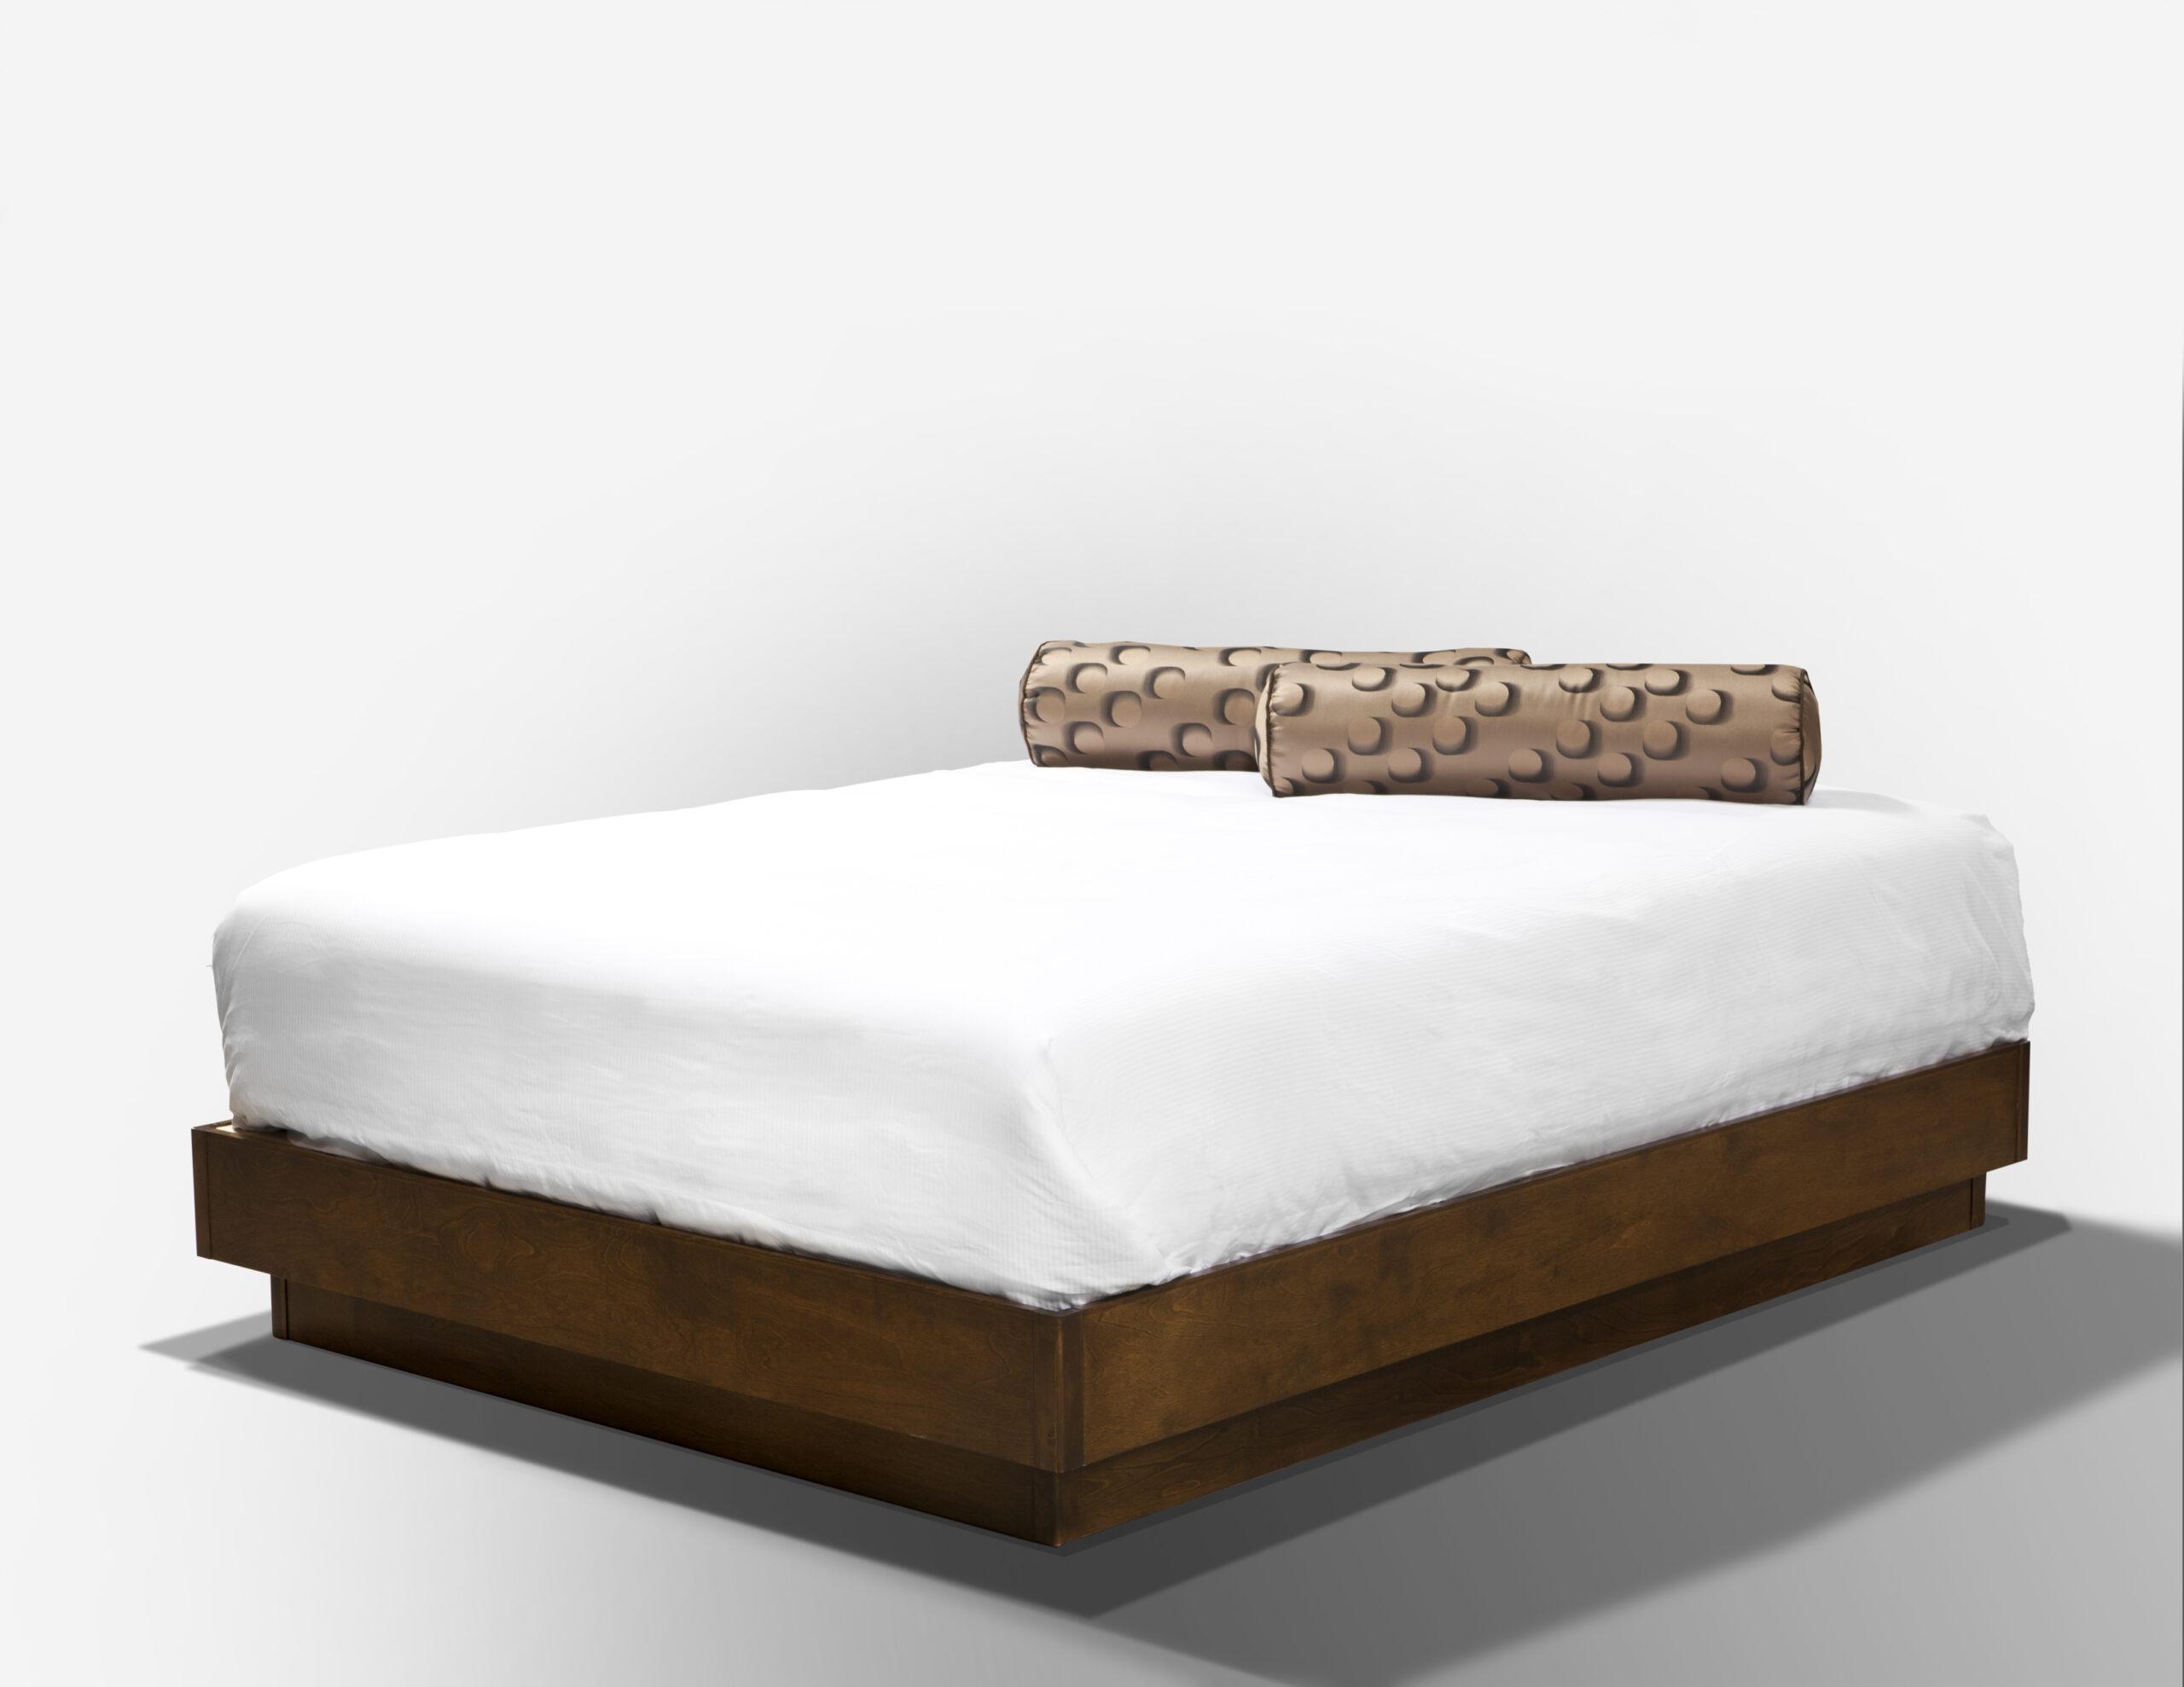 Furniture Coup de pied / Foot Kick 460CP